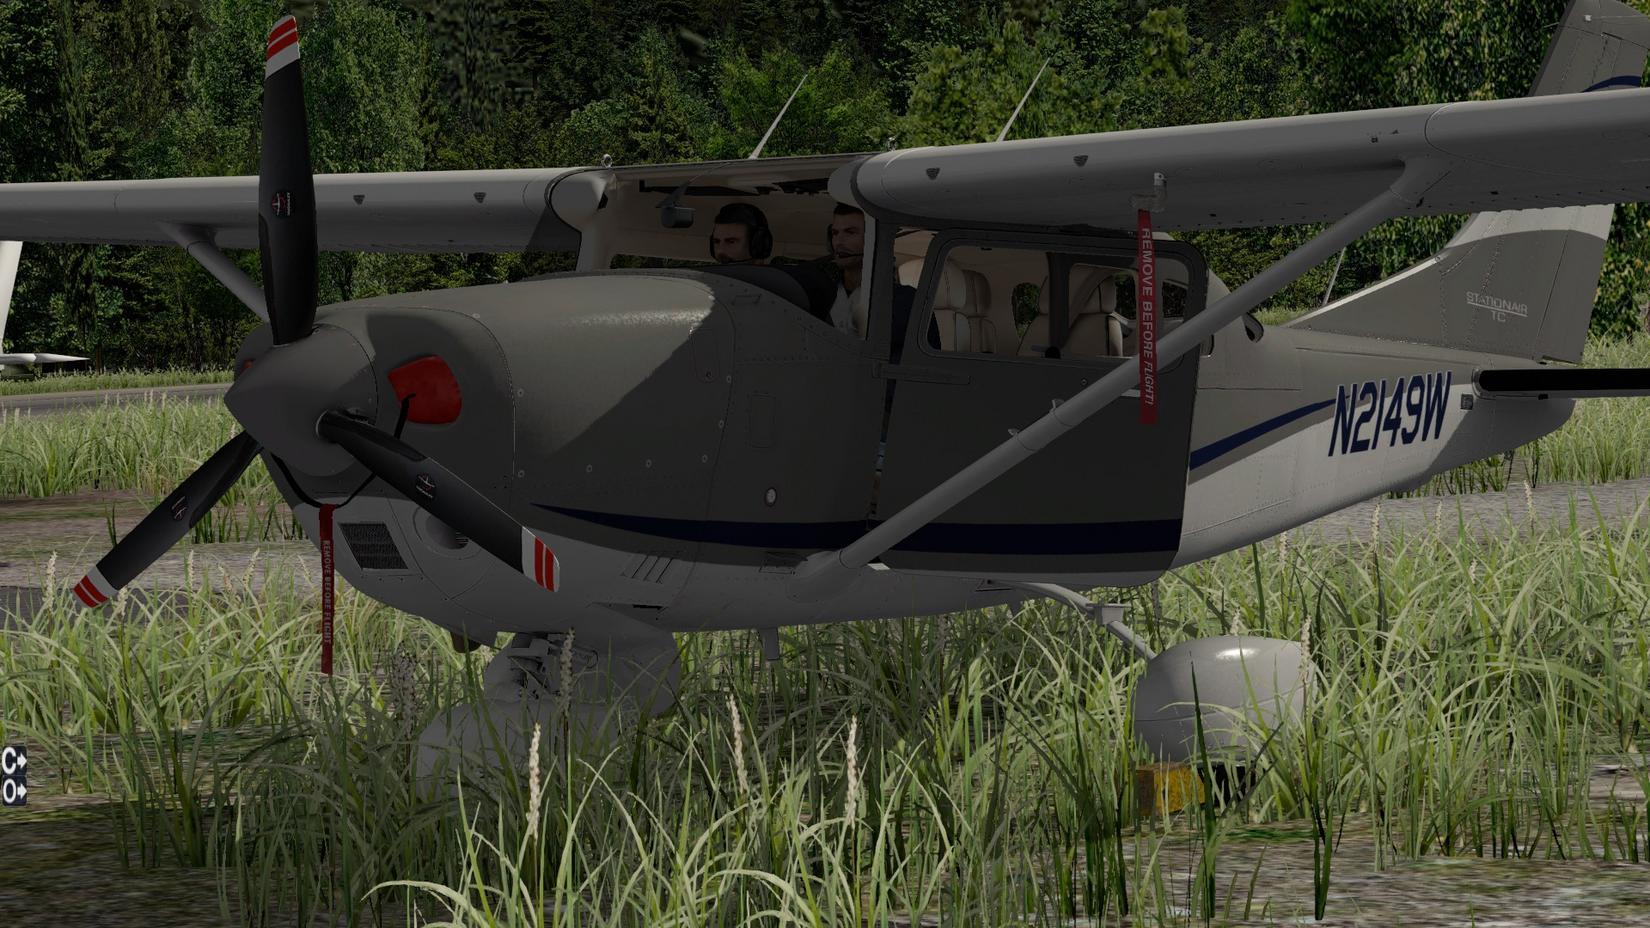 Carenado Cessna 206 X-Plane 10 - SimHQ Forums